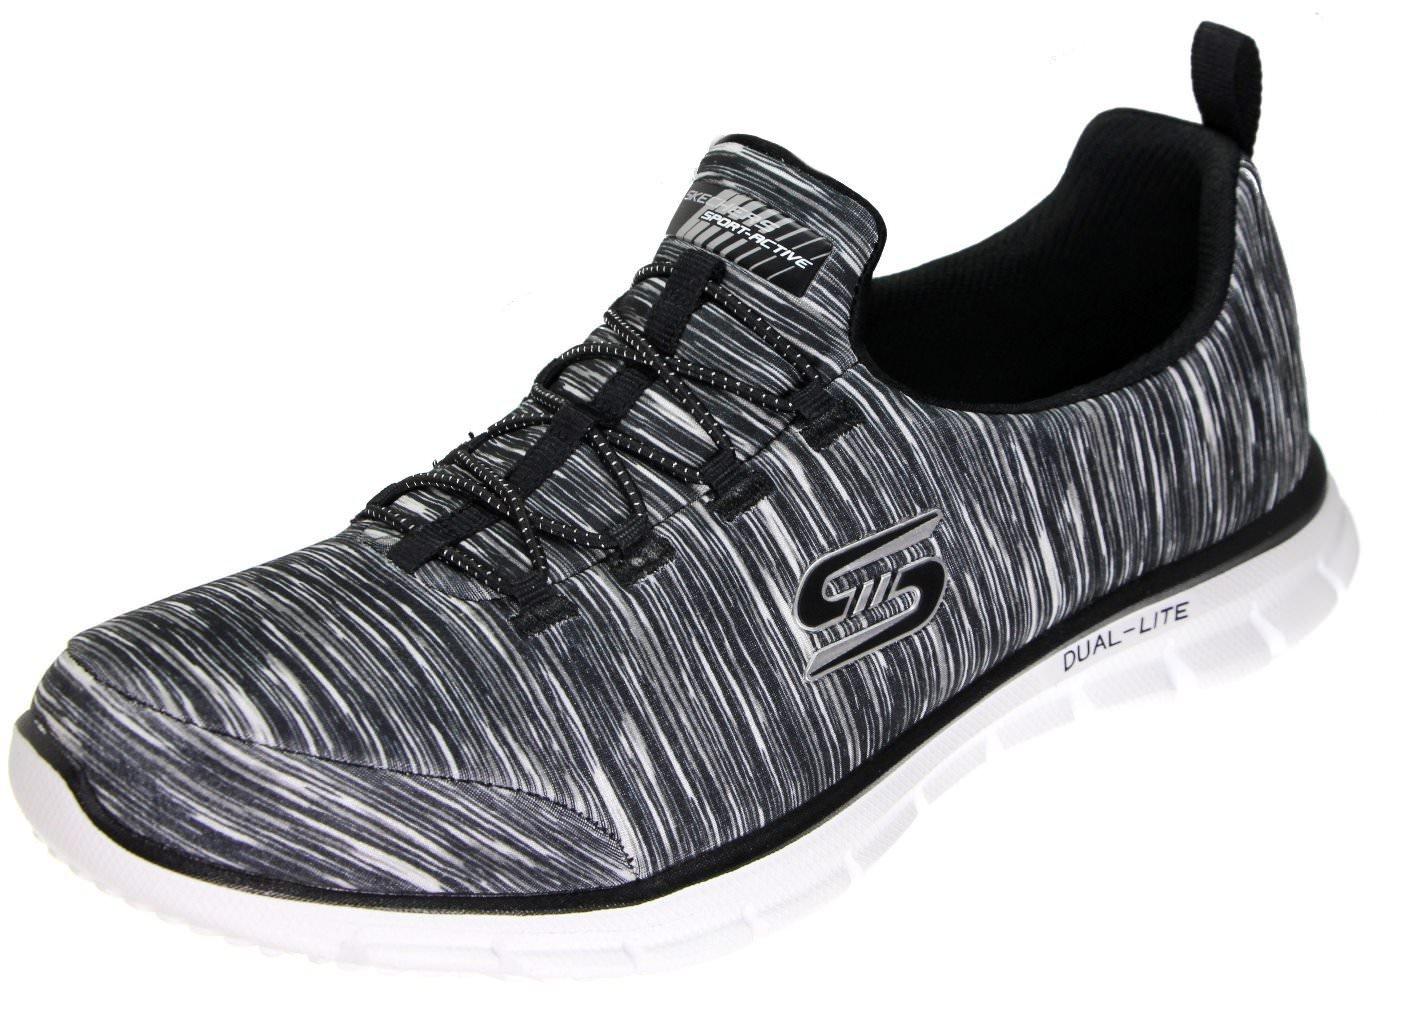 Skechers Sport Women's Glider Electricity Sneaker B079RCKW3B 8.5 B(M) US|Black/White Stripes